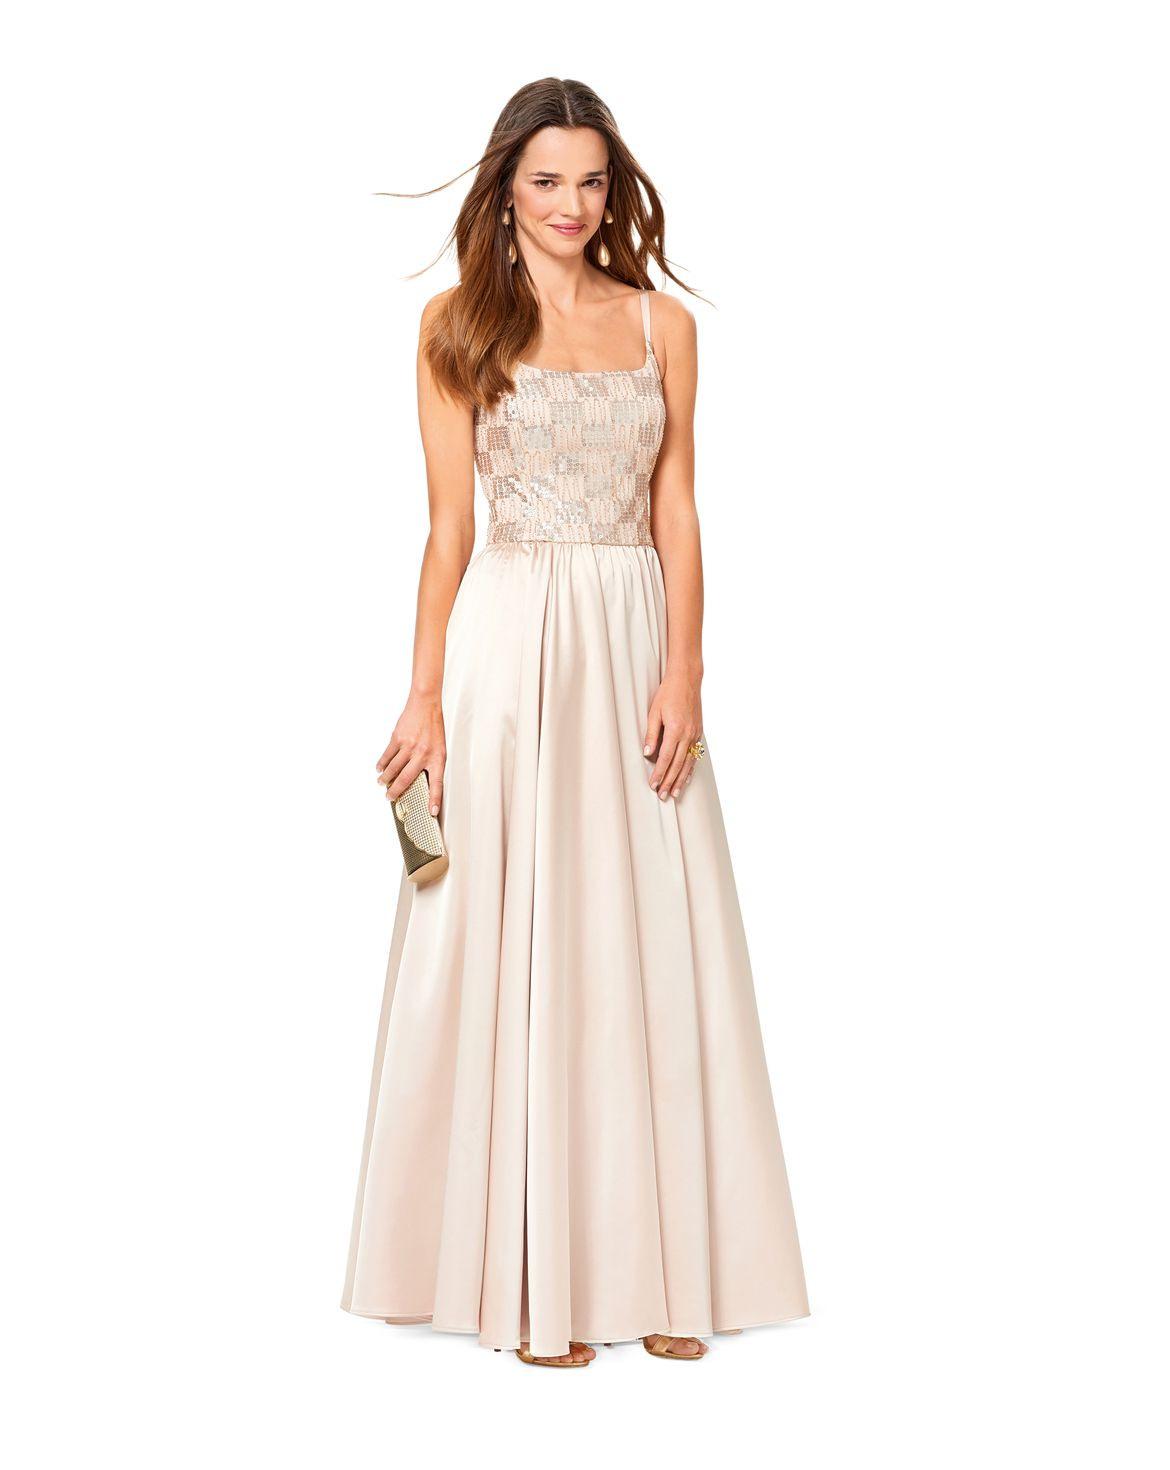 15 Einfach Abendkleid Selber Nähen Spezialgebiet15 Erstaunlich Abendkleid Selber Nähen Ärmel